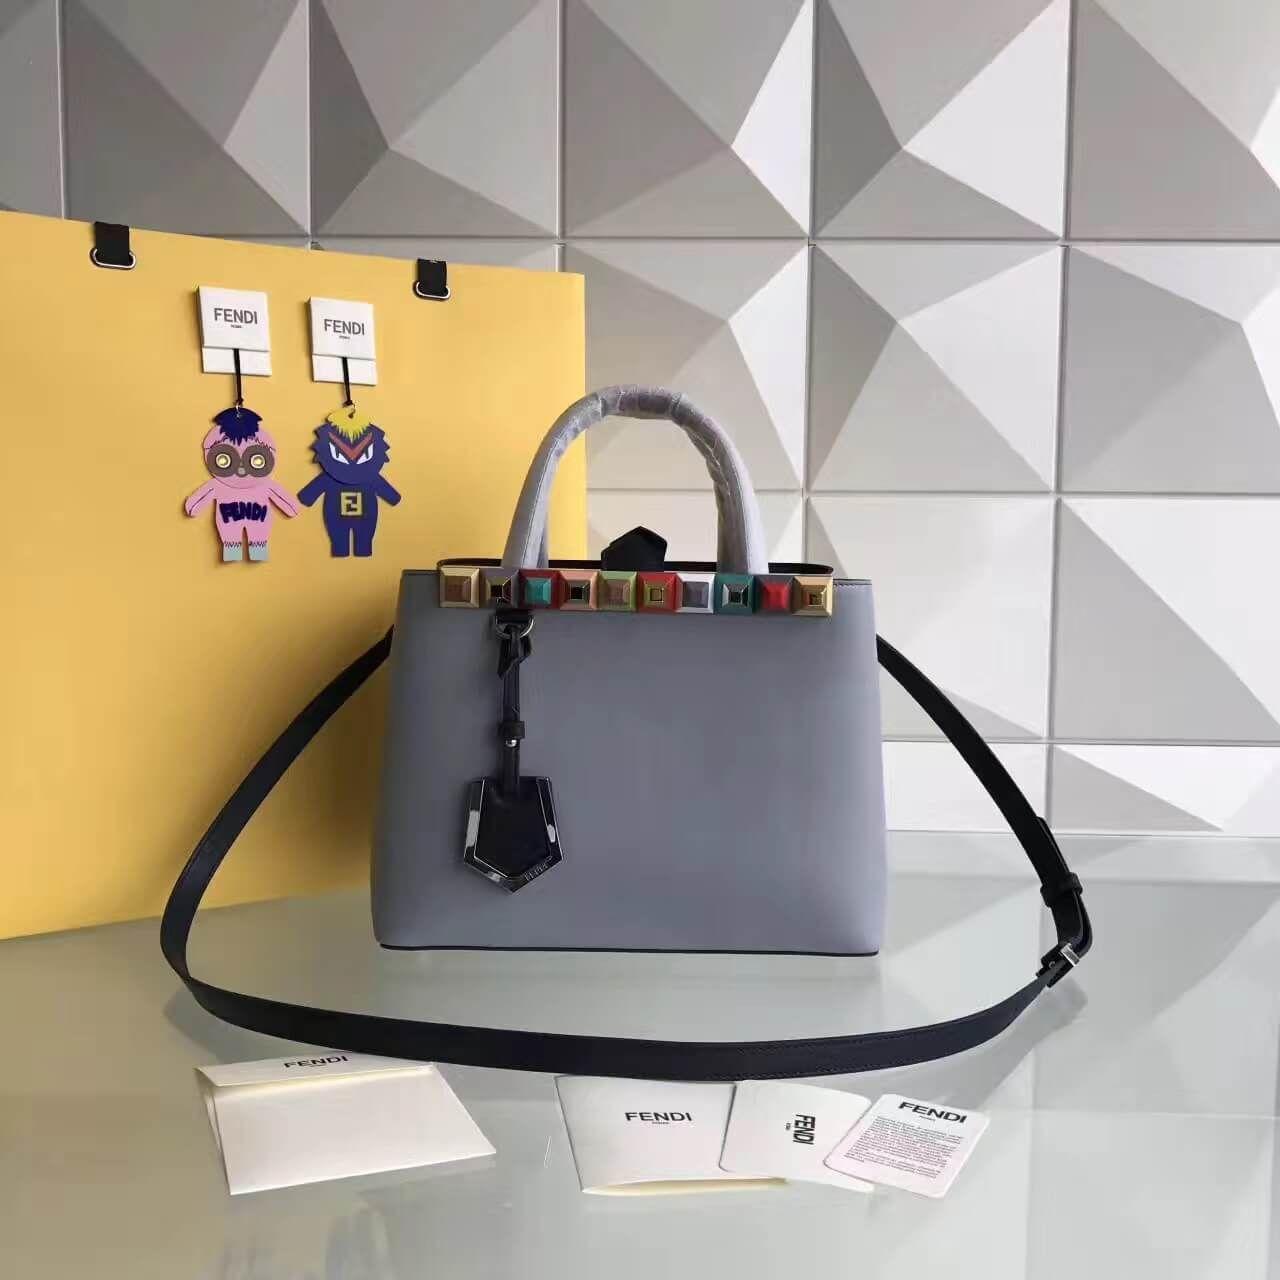 912d217d6ccb Fendi Calfskin 2Jours Bag With Multicoloured Studs Light Blue 2017 ...